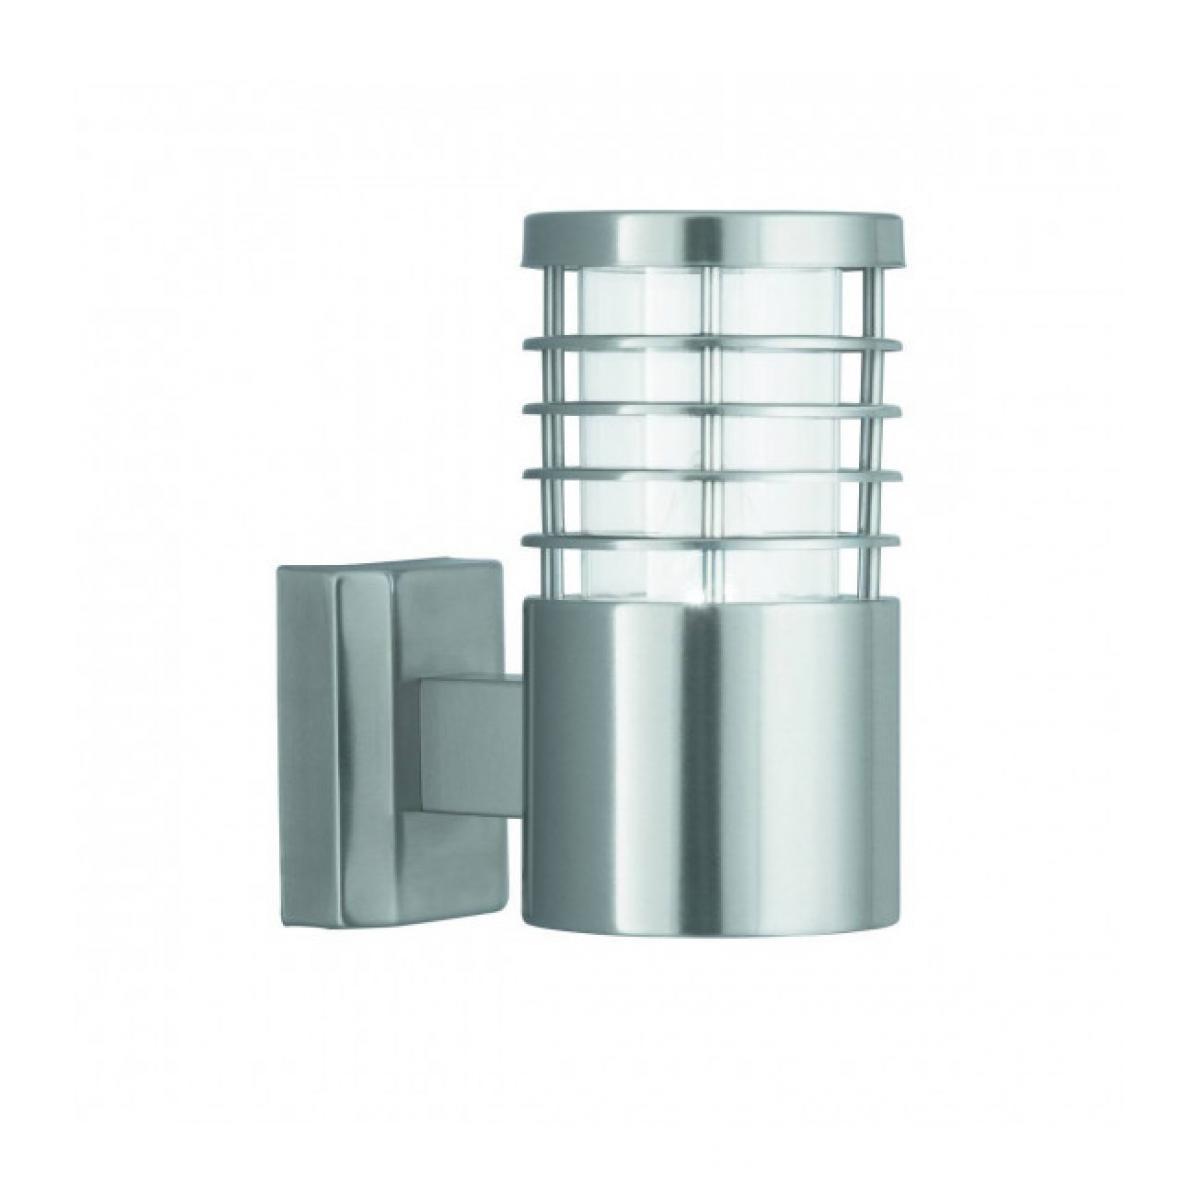 Searchlight Applique Outdoor Lights 20 cm, en acier inoxydable et polycarbonate